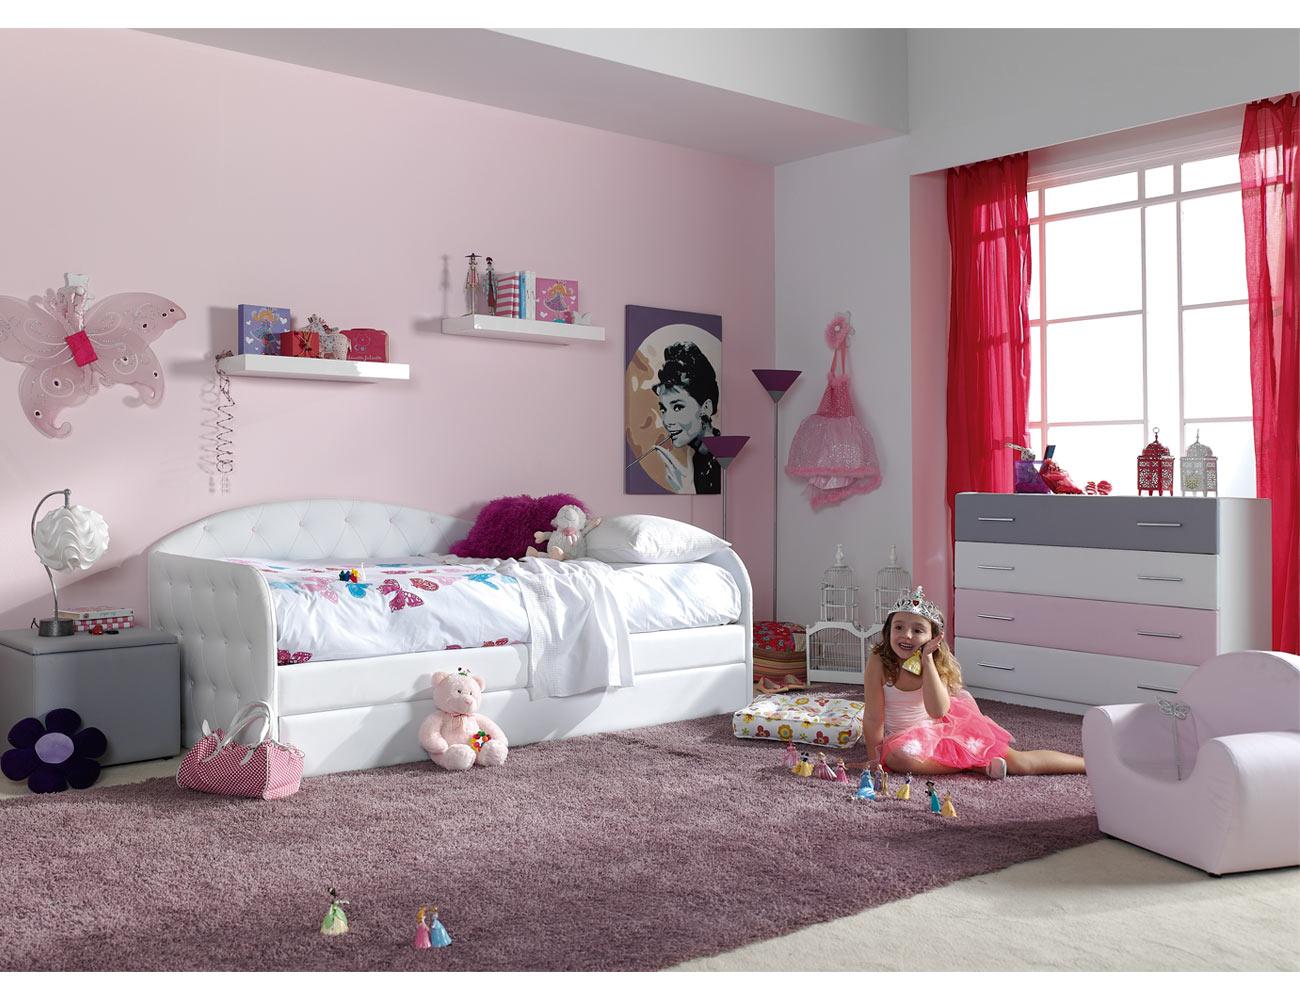 243 cama nido3